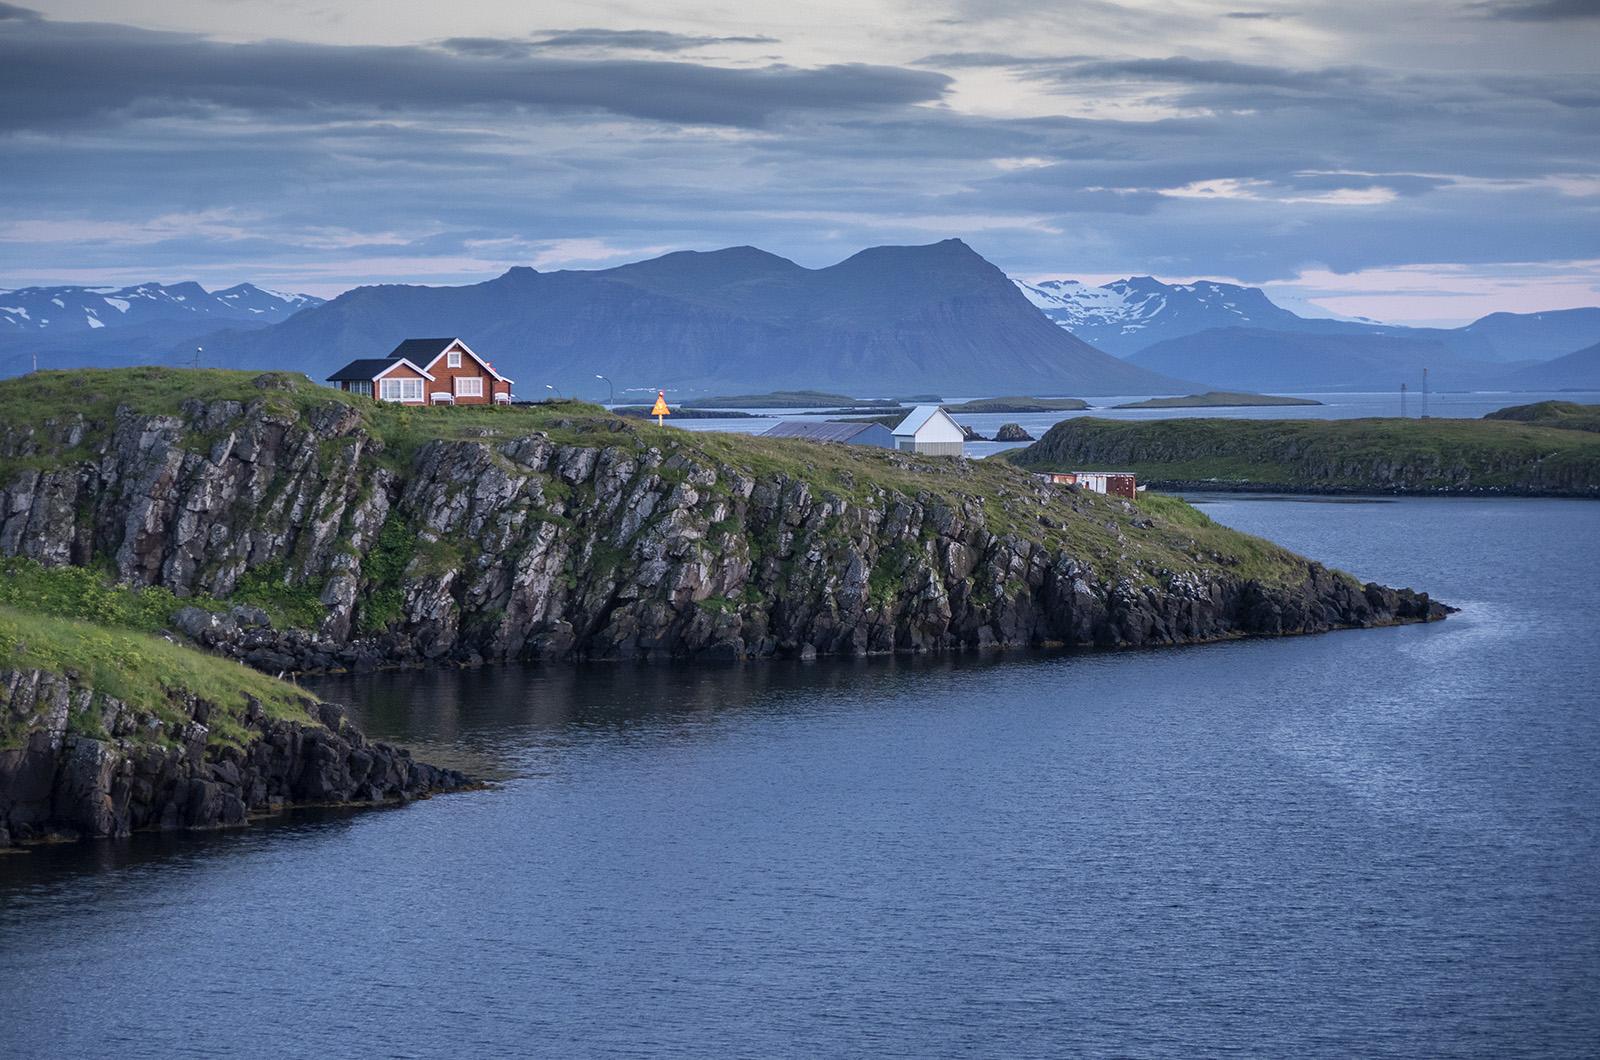 Iceland P1170872 no logo.jpg